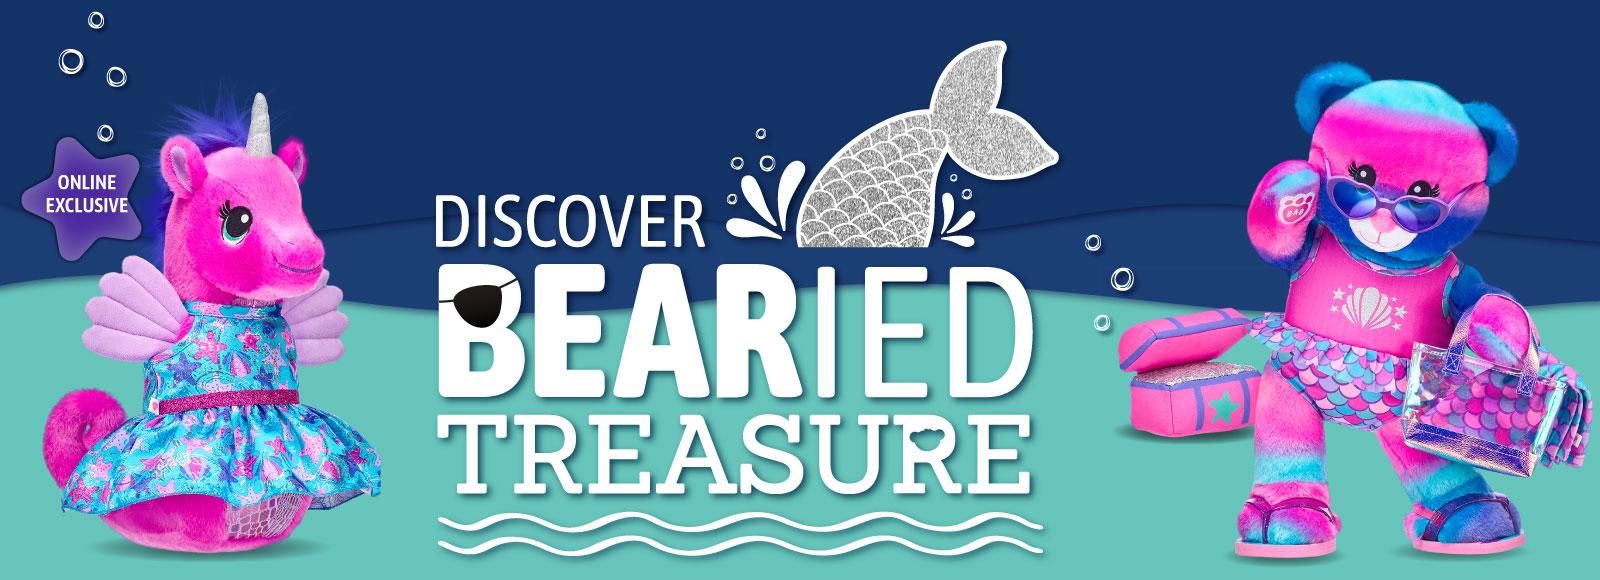 Discover BEARied Treasure